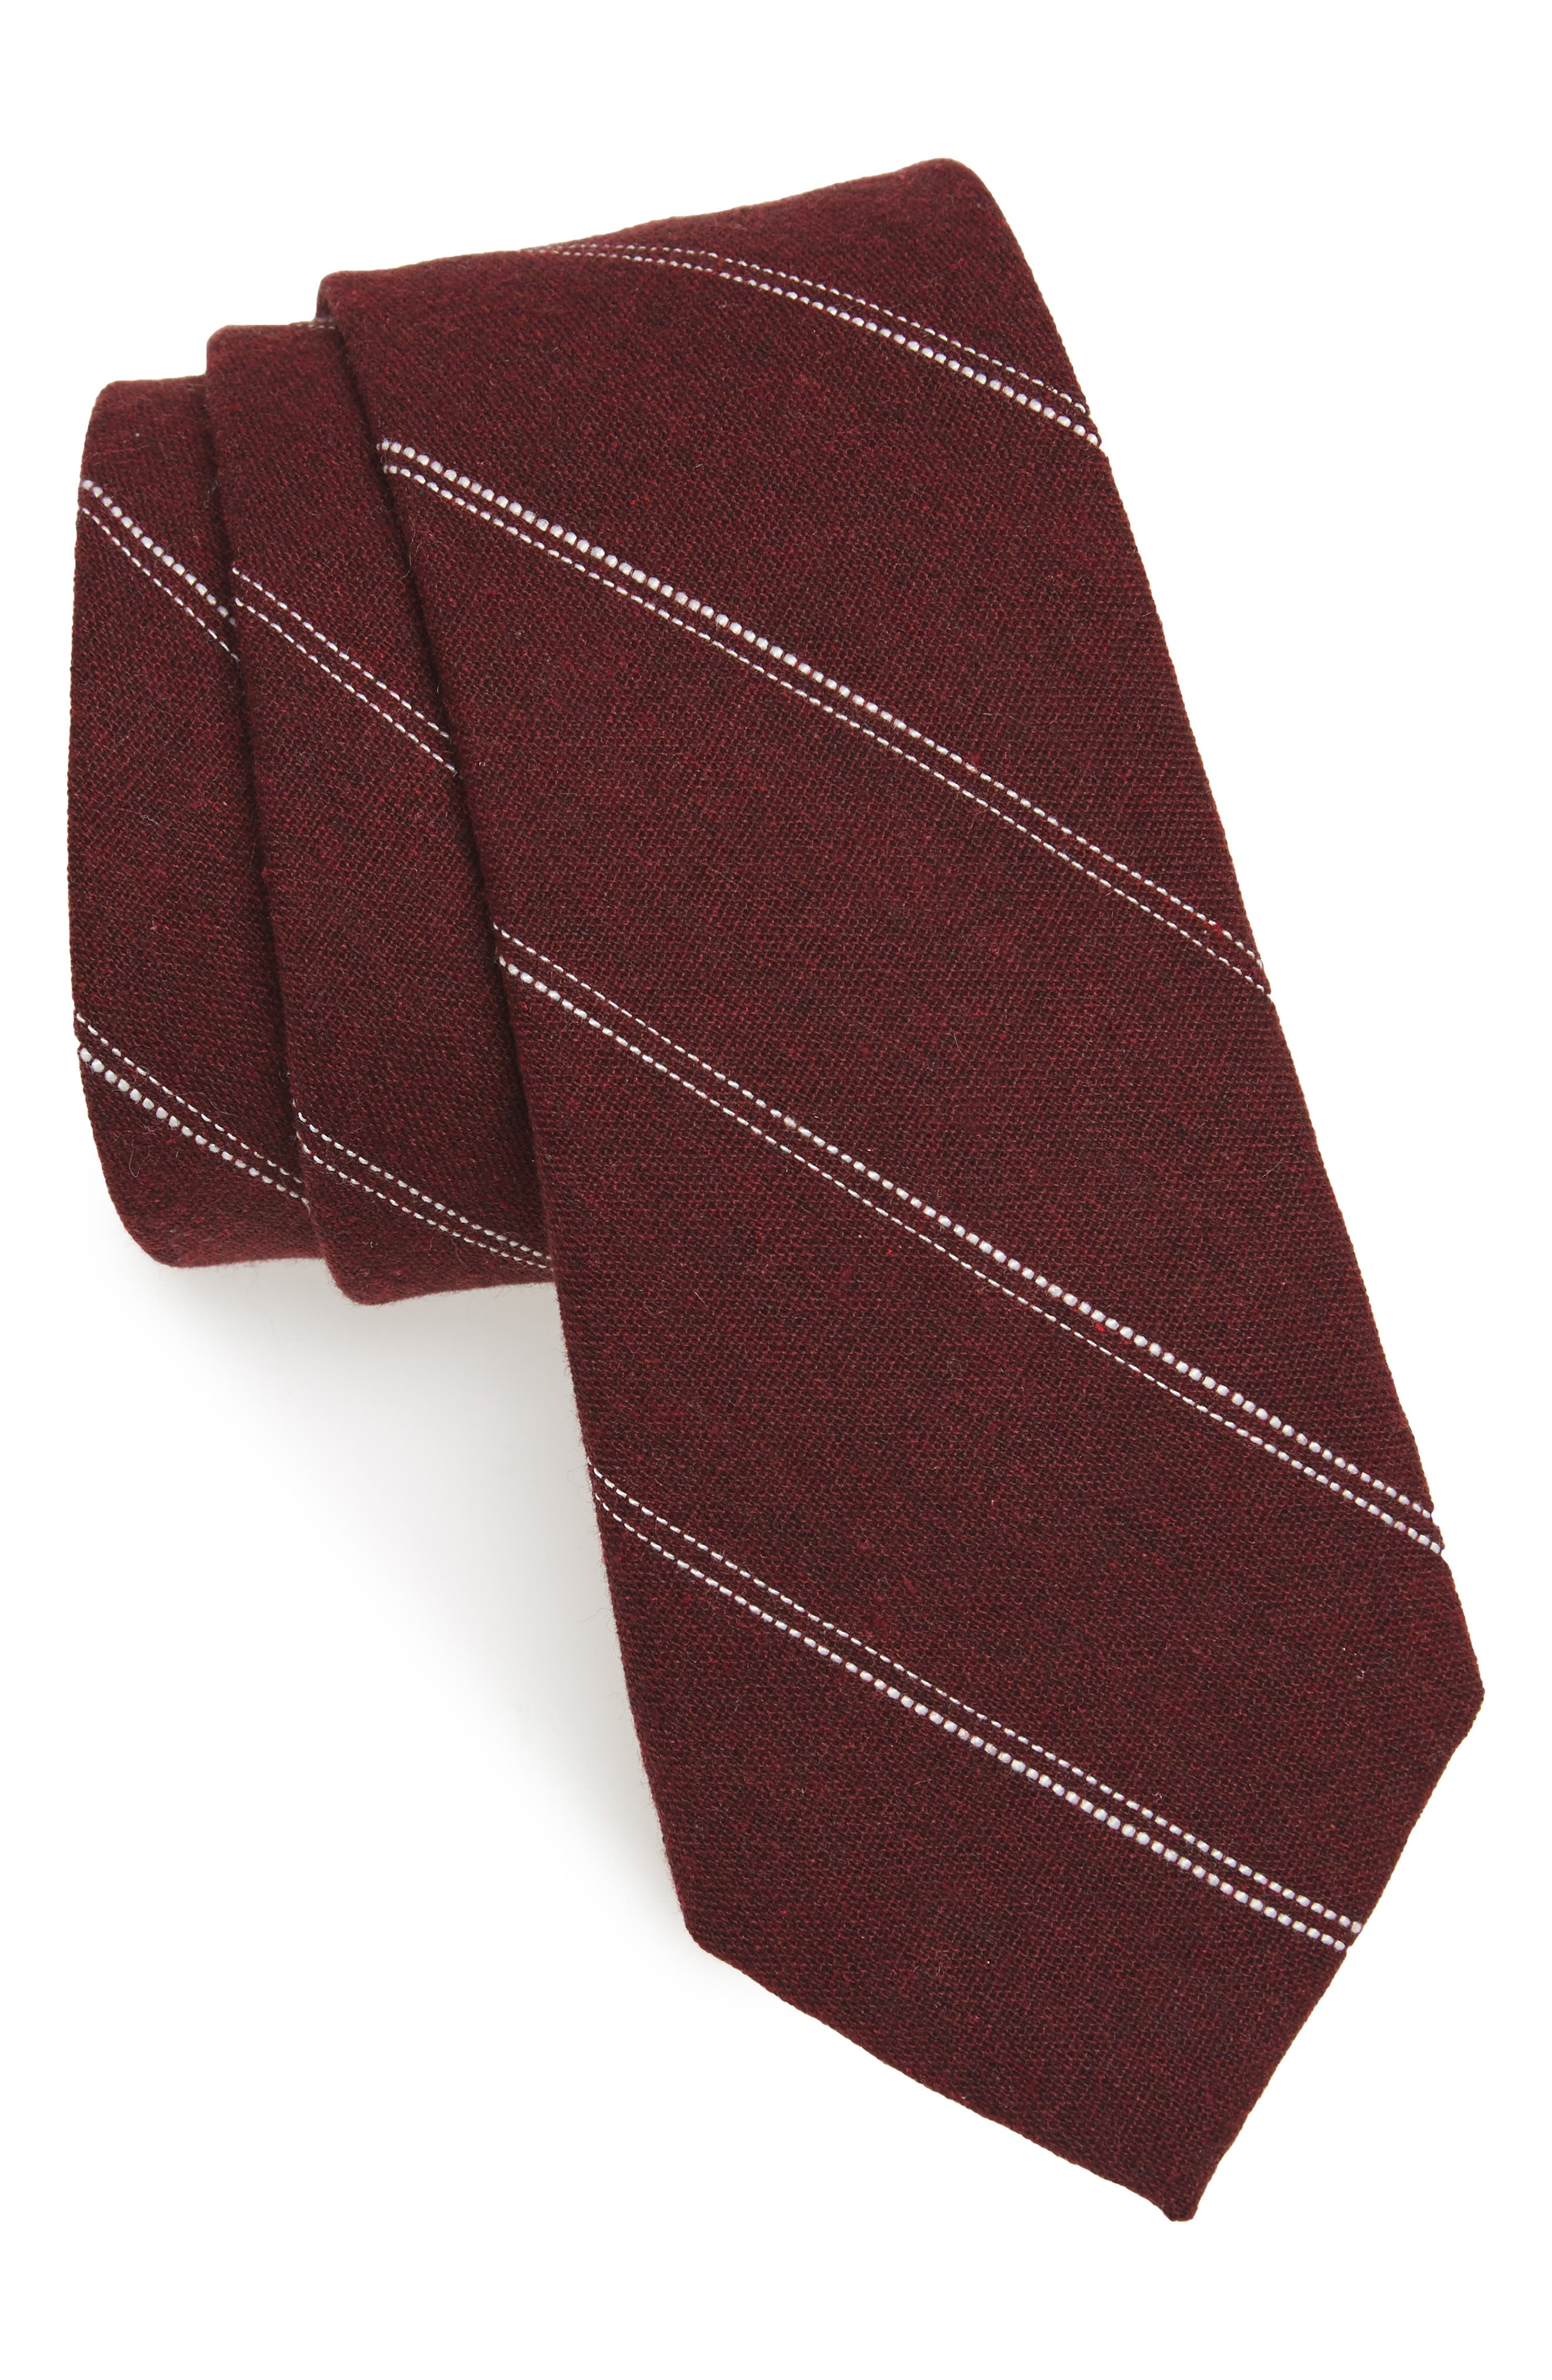 Nordstrom Men's Shop Palamino Stripe Cotton & Linen Skinny Tie